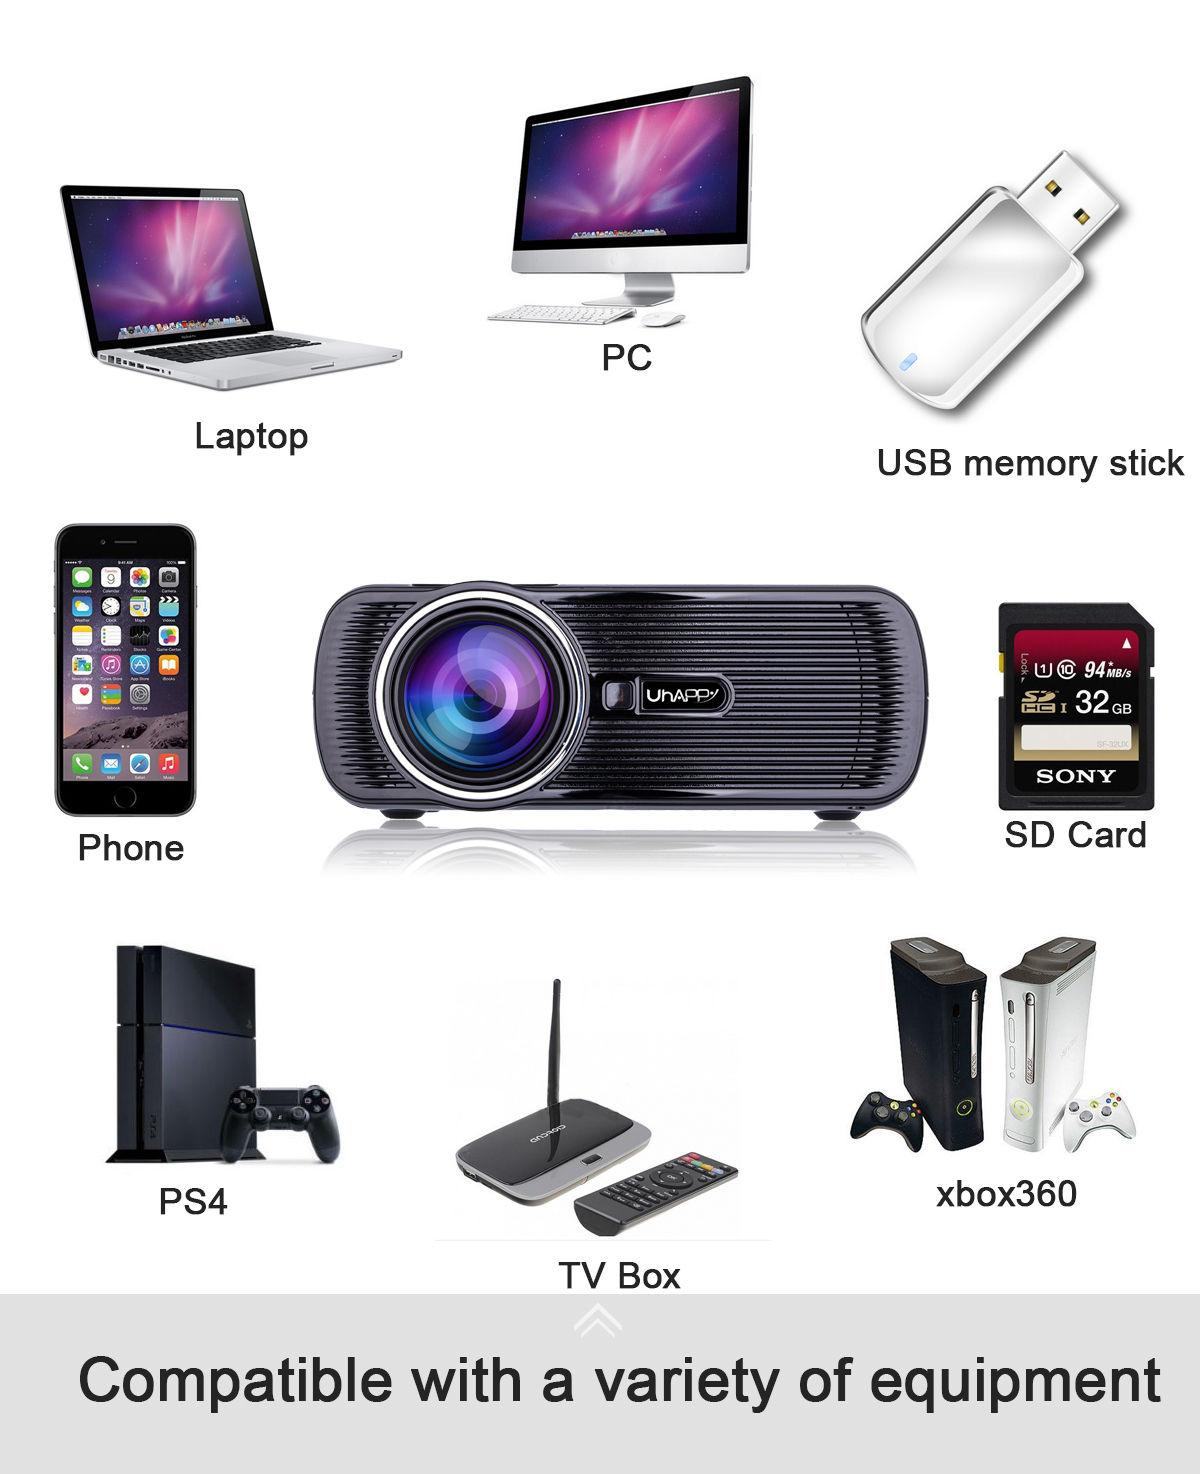 Jual Beli Mini Projector 1080p Hd Home Theater With Hdmi Usb Sd Vga Cus In224 Svga Detail Produk Av Tv Port Black Au Plug Intl